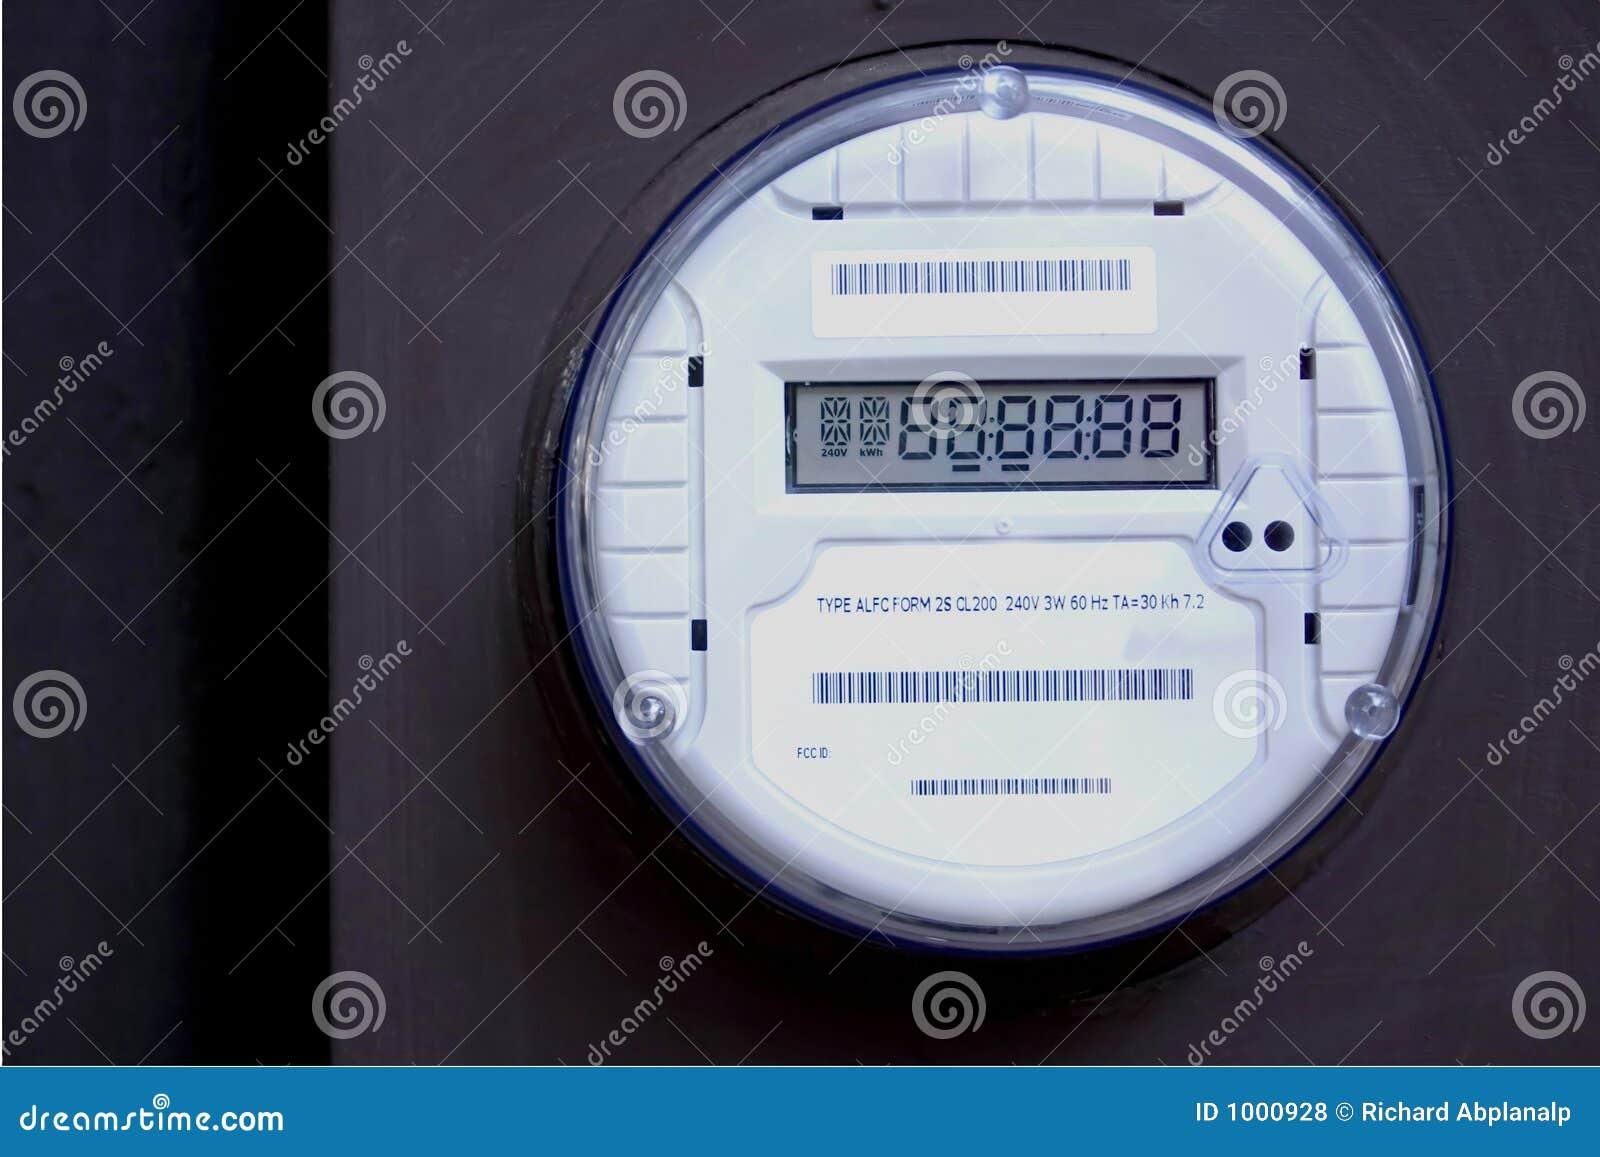 Smart Meter 2 Royalty Free Stock Photos Image 1000928